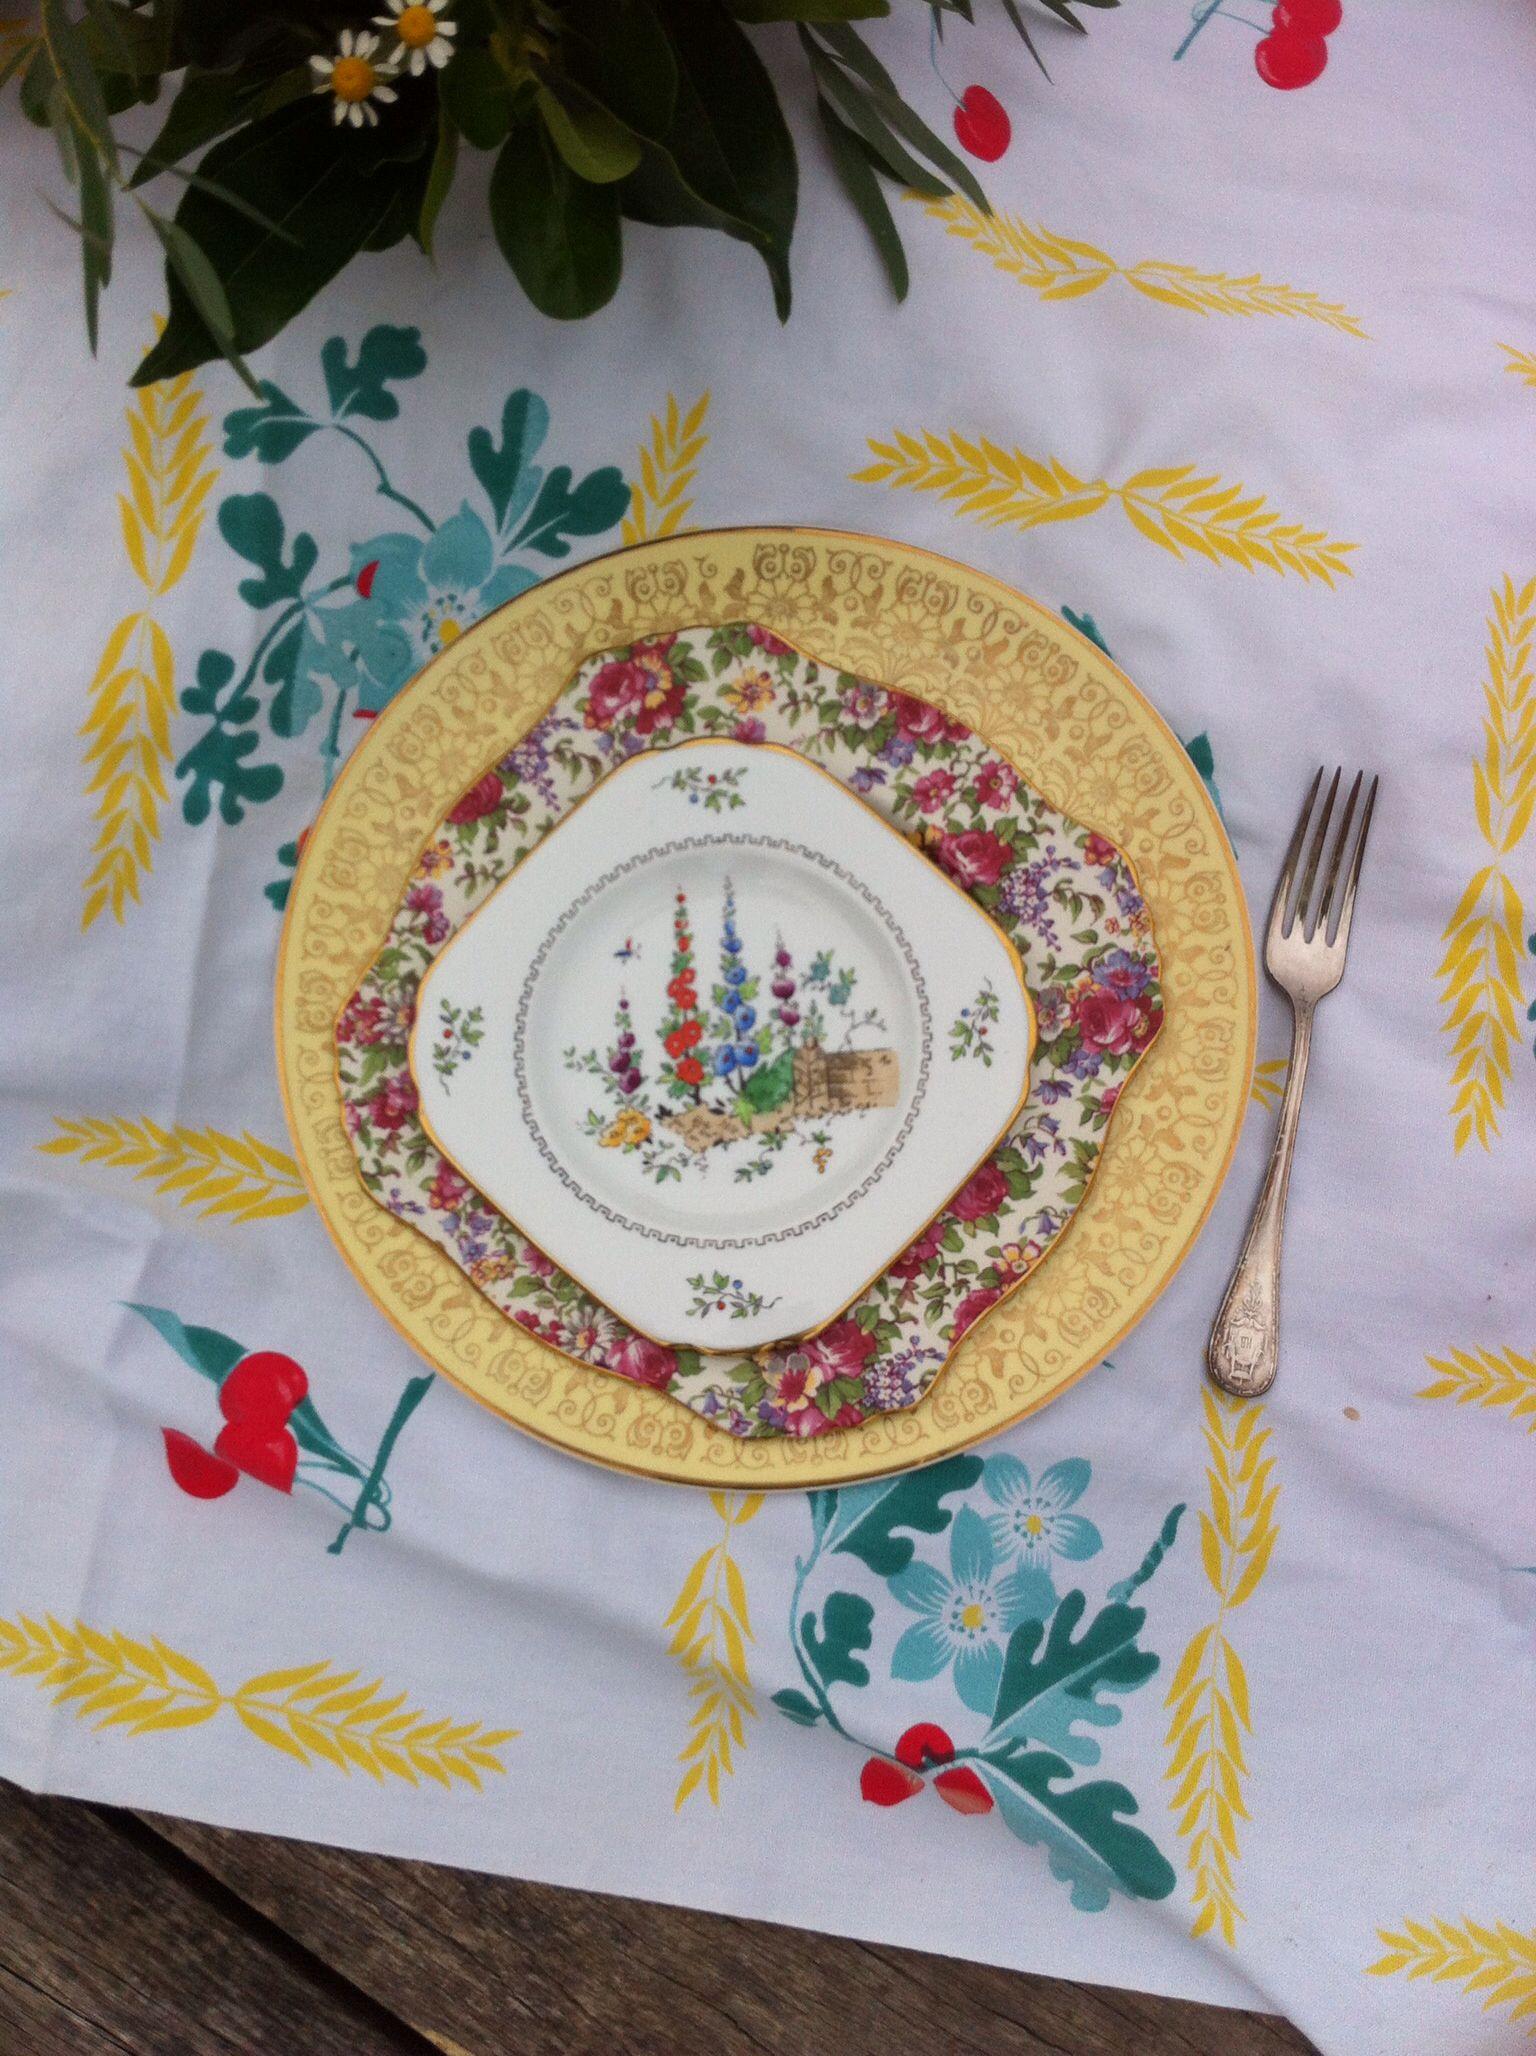 Love tall hollyhocks on this square dessert plate  #wedding#vintagechina#vintageplate#englishchina#atlantarentals